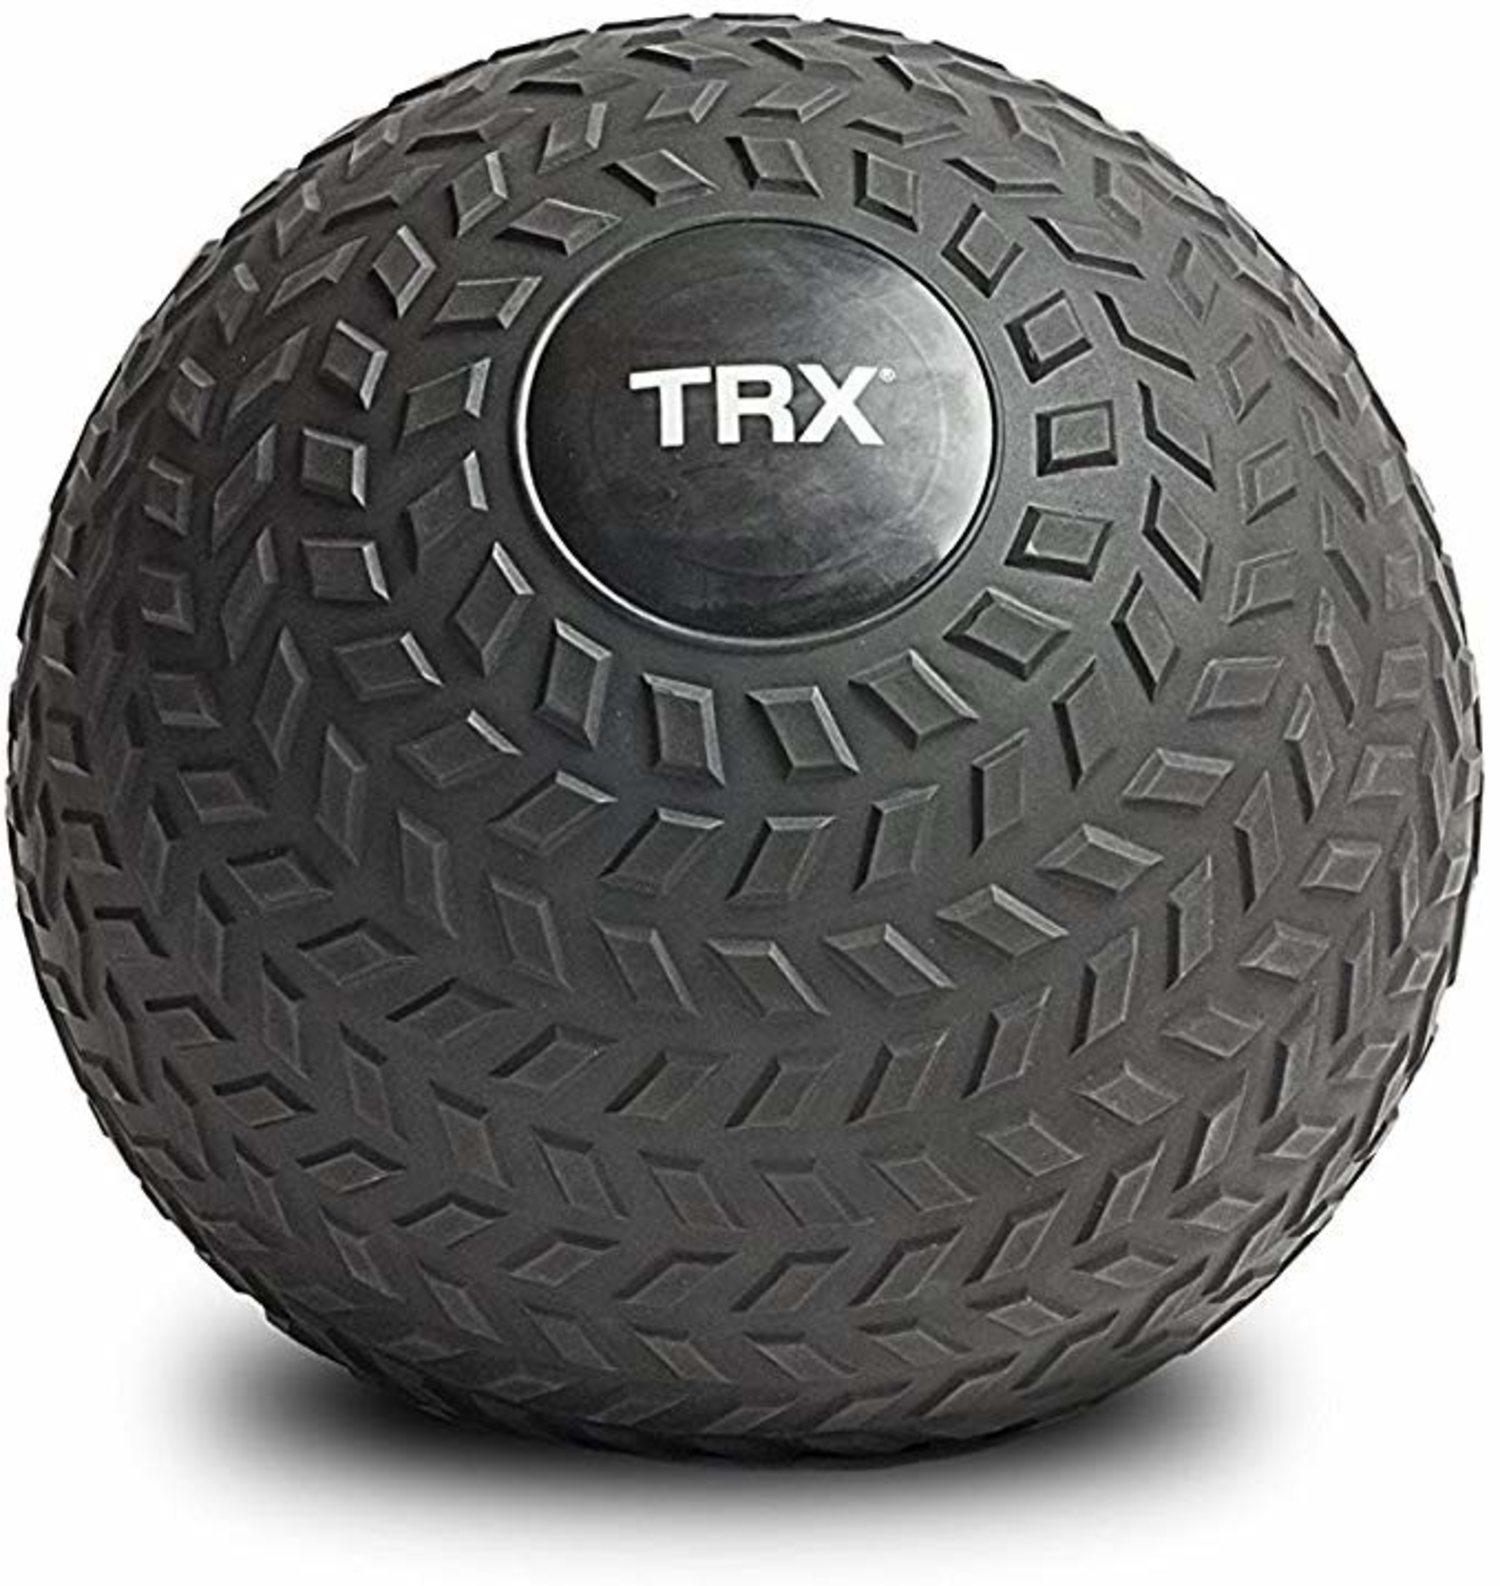 Balón medicinal TRX 9 kg.